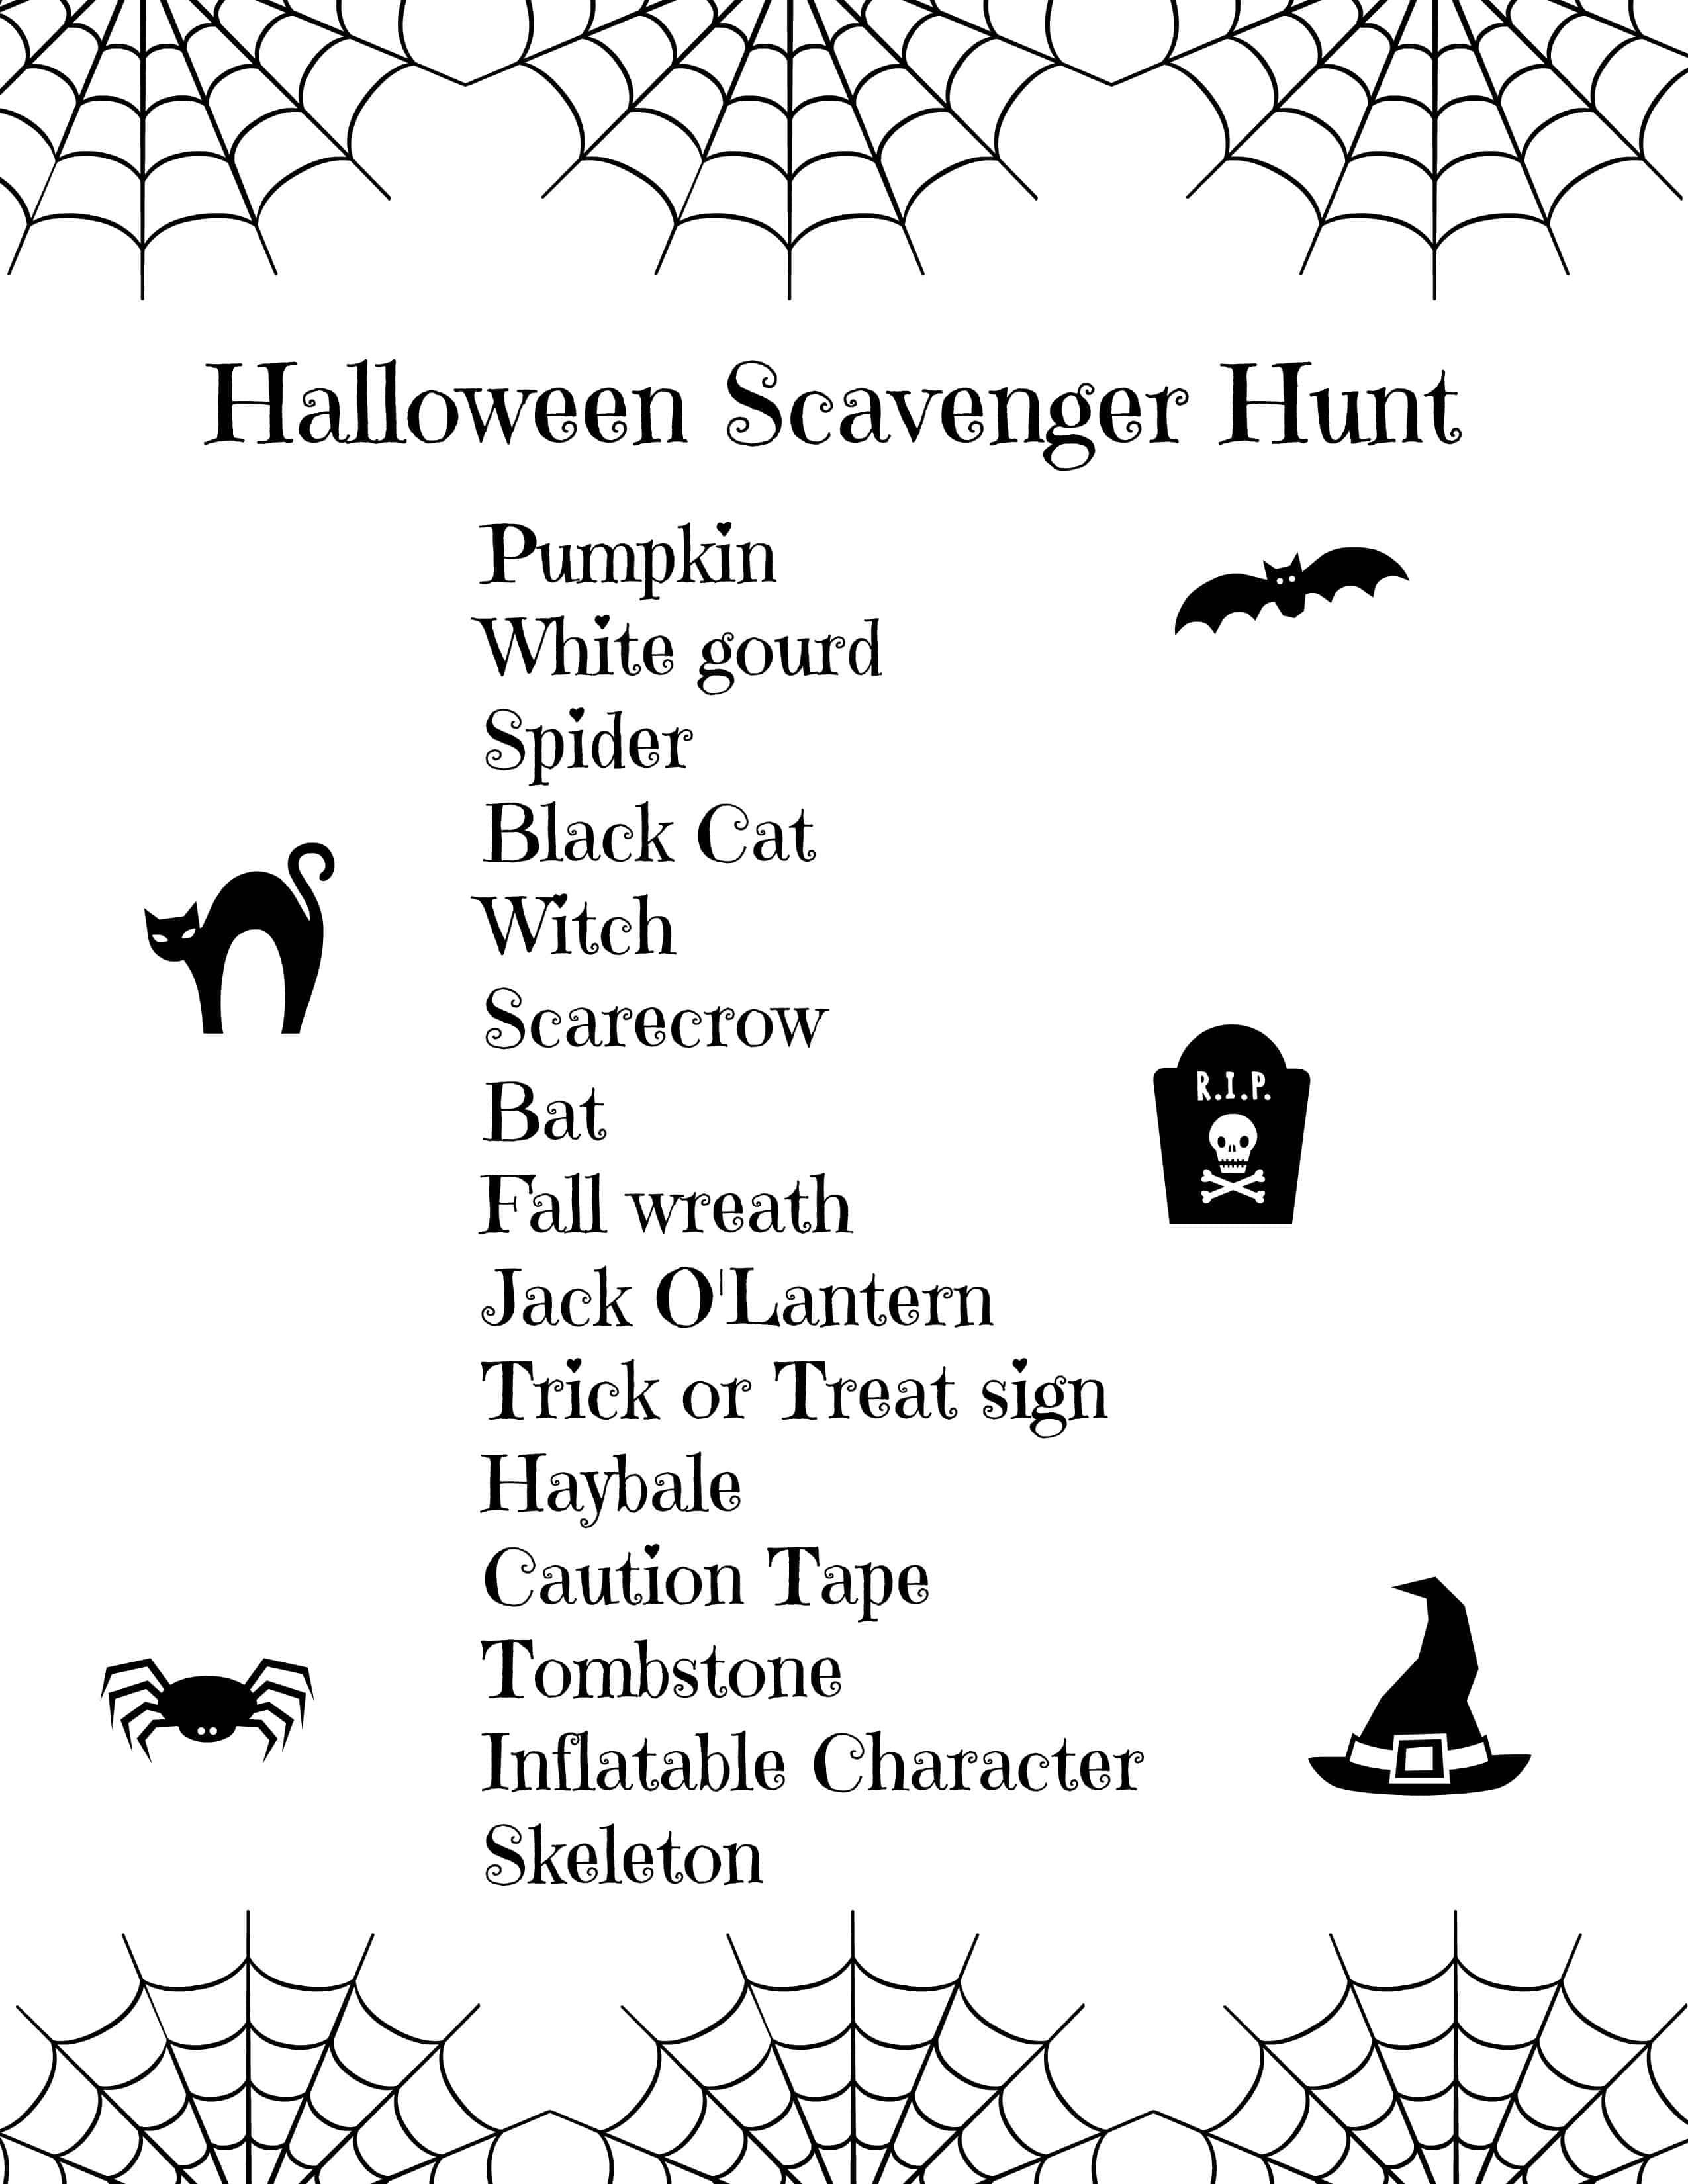 Free Printable Halloween Scavenger Hunt for Kids - Seaside Sundays